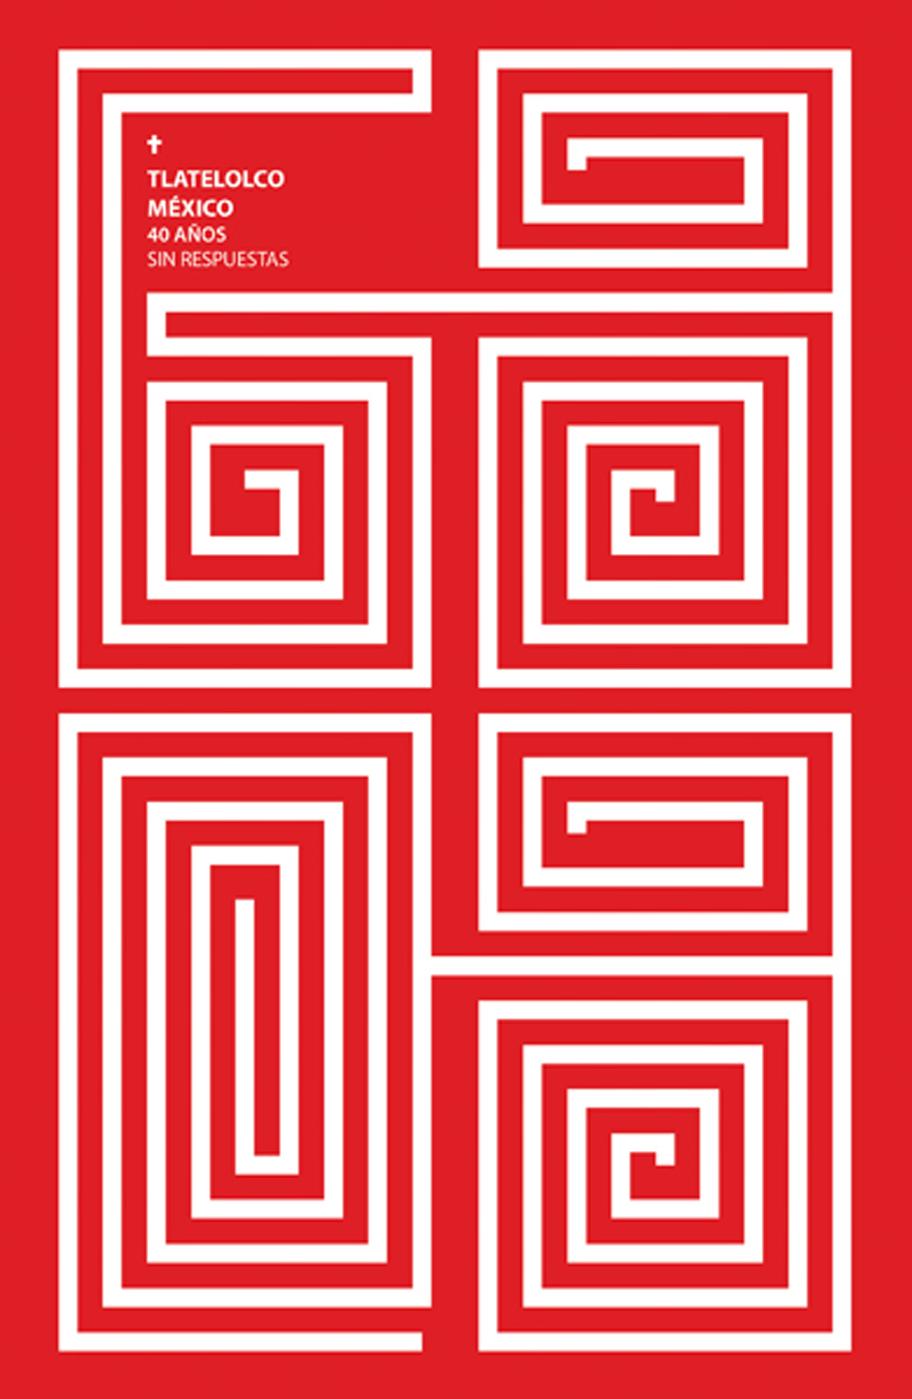 erendida mancilla - typo/graphic posters